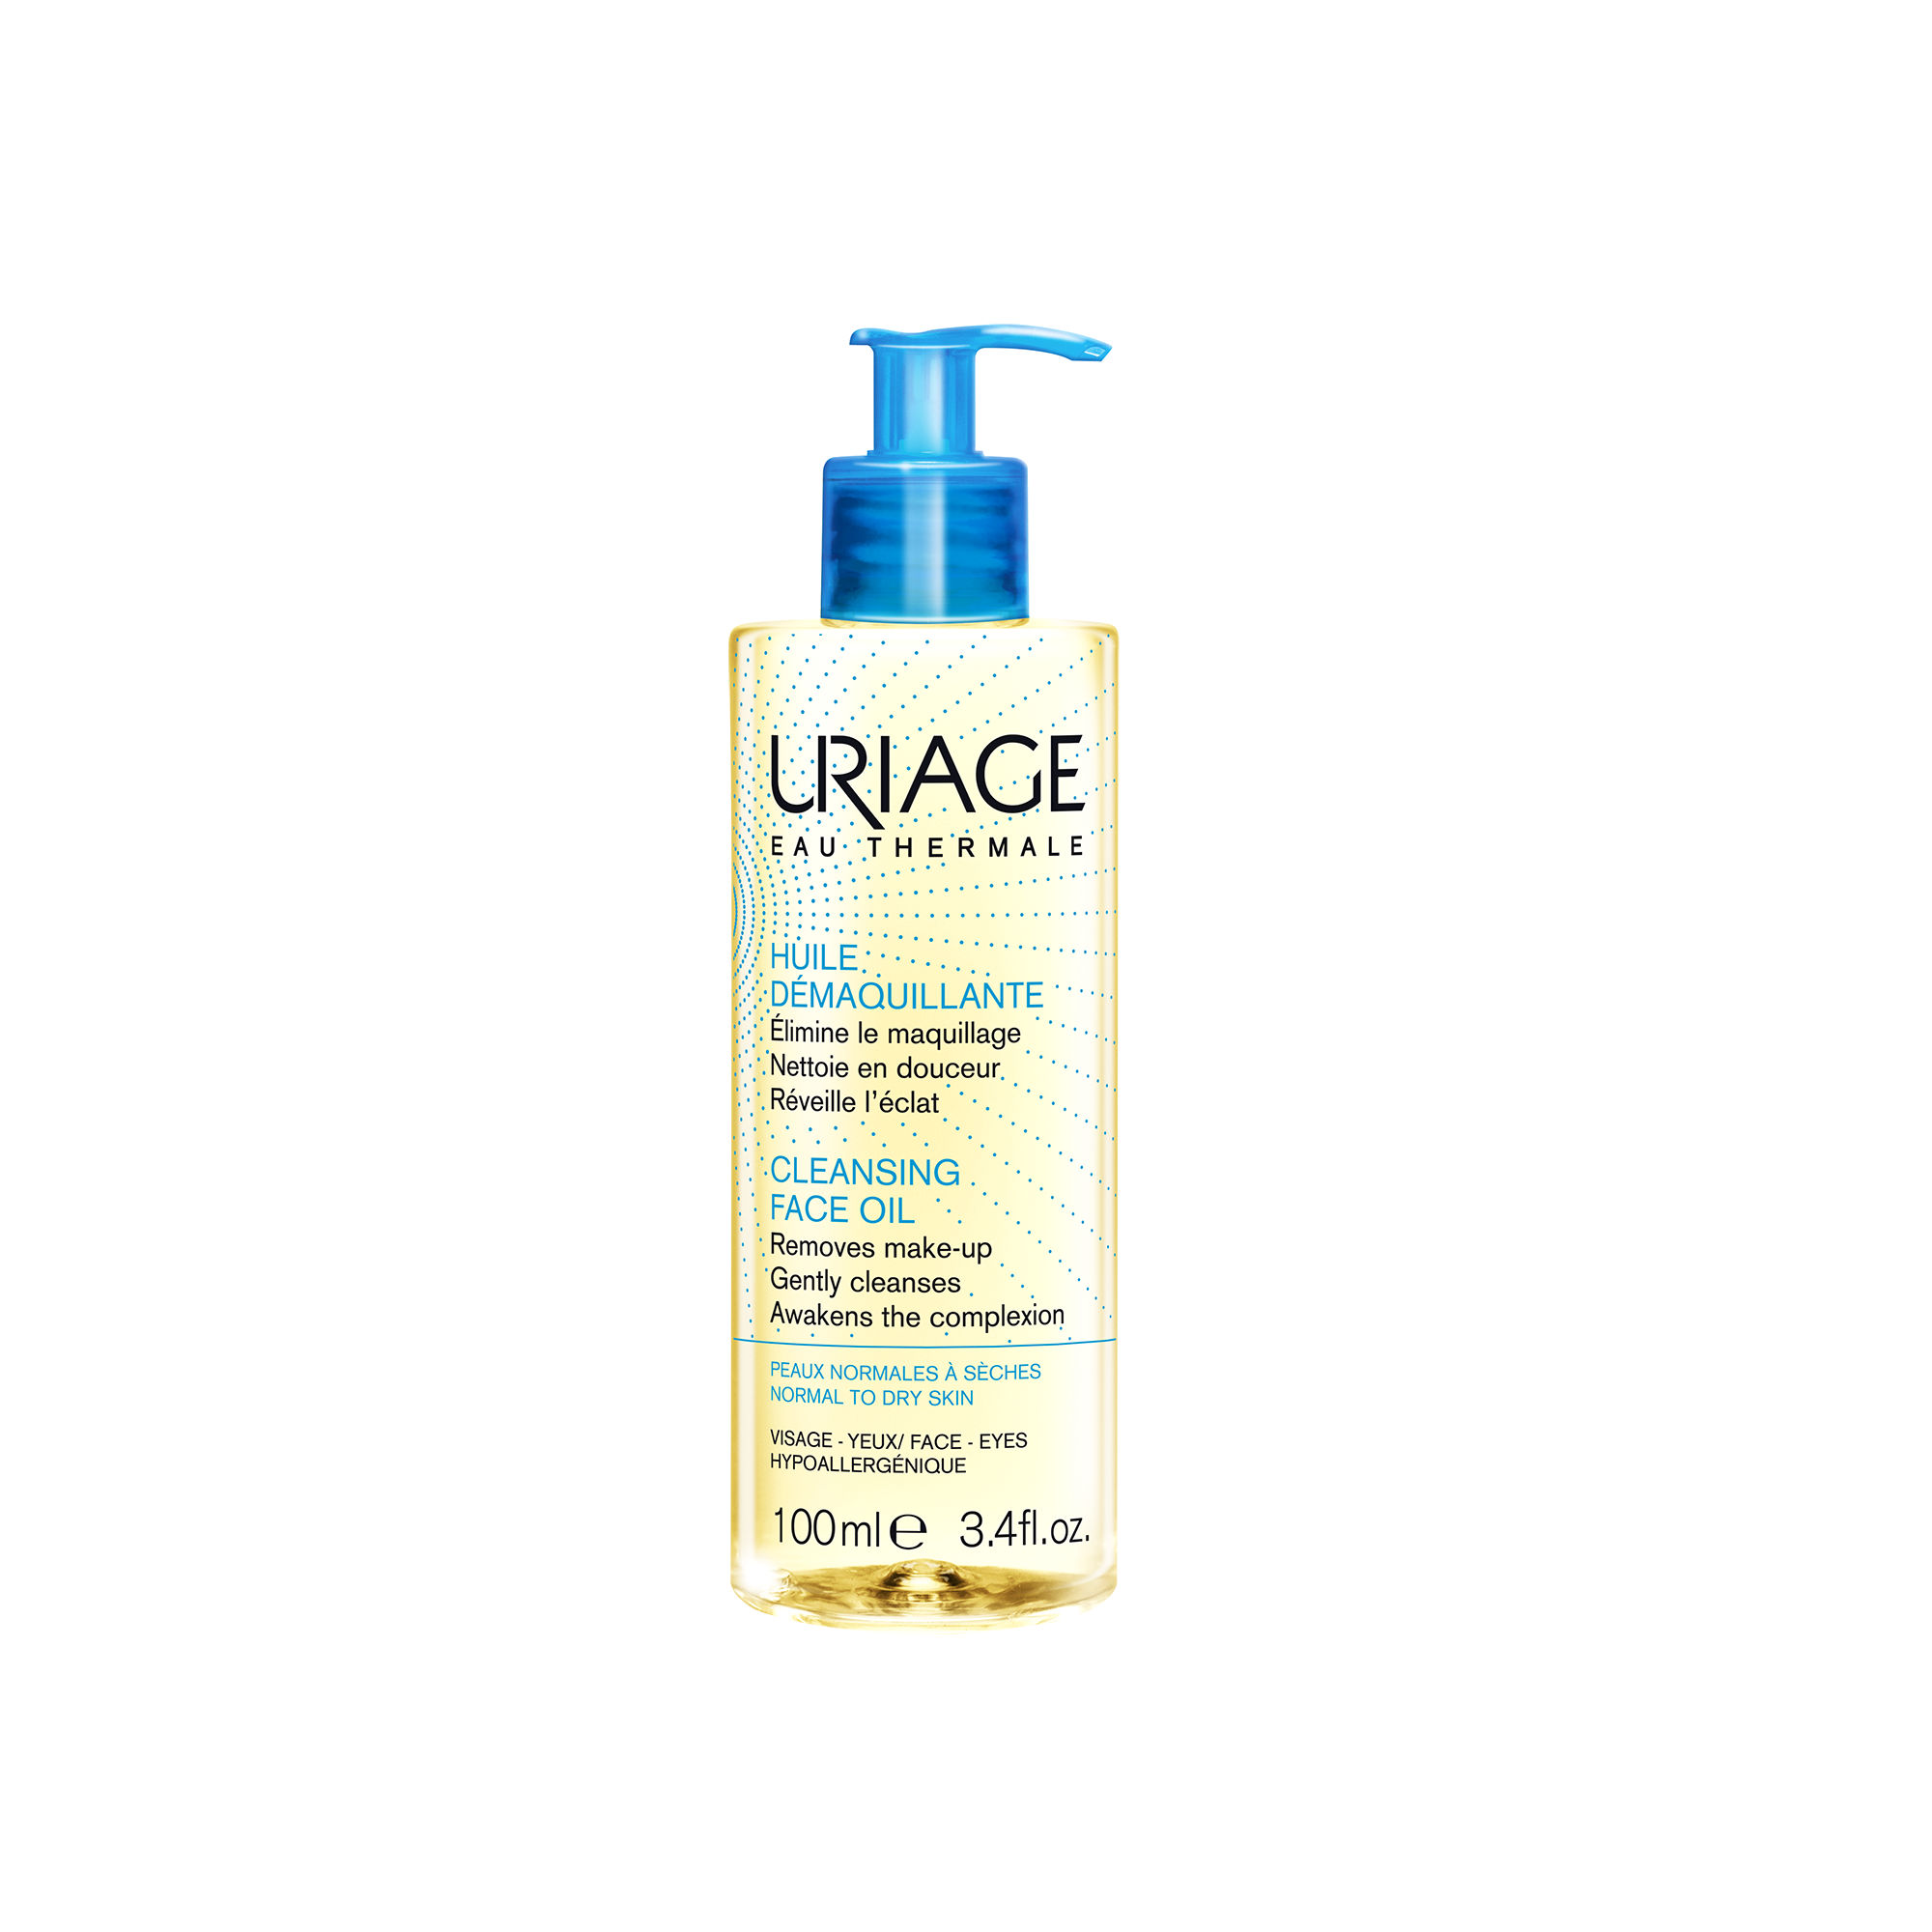 Uriage Eau Thermale Cleansing Face Oil Απομακρύνει το Μακιγιάζ το Σμήγμα και τους Ρύπους 100ml